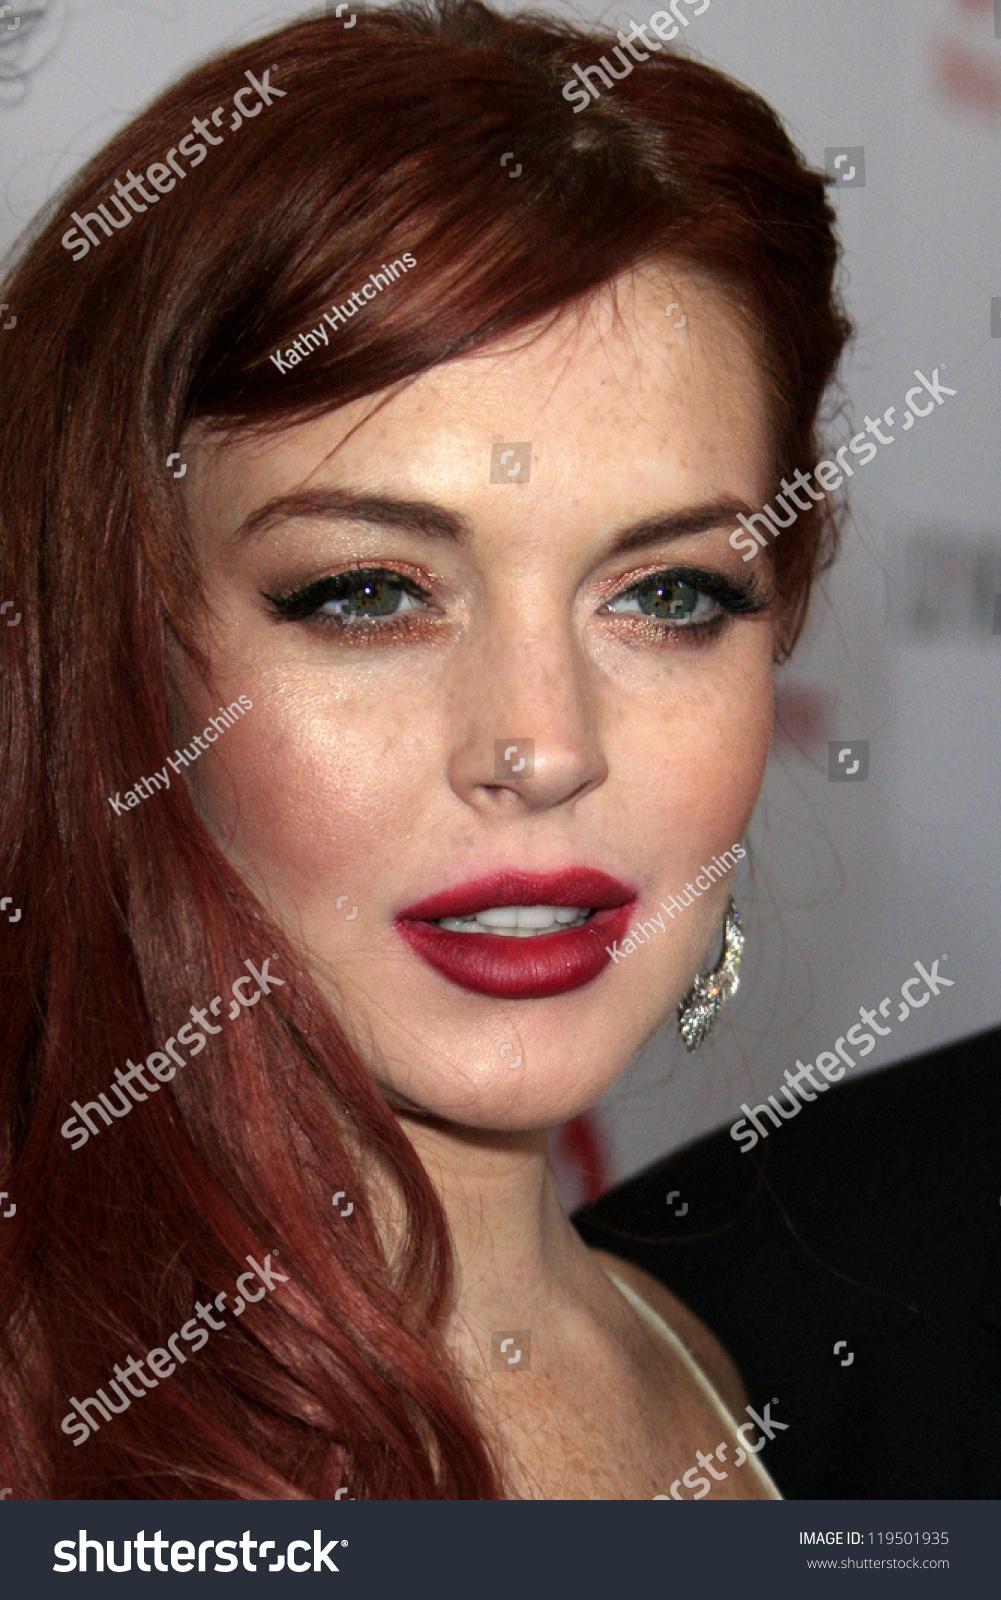 Dot Jones,Condola Rashad Porno movies Nicole Trunfio AUS,Caroline Quentin